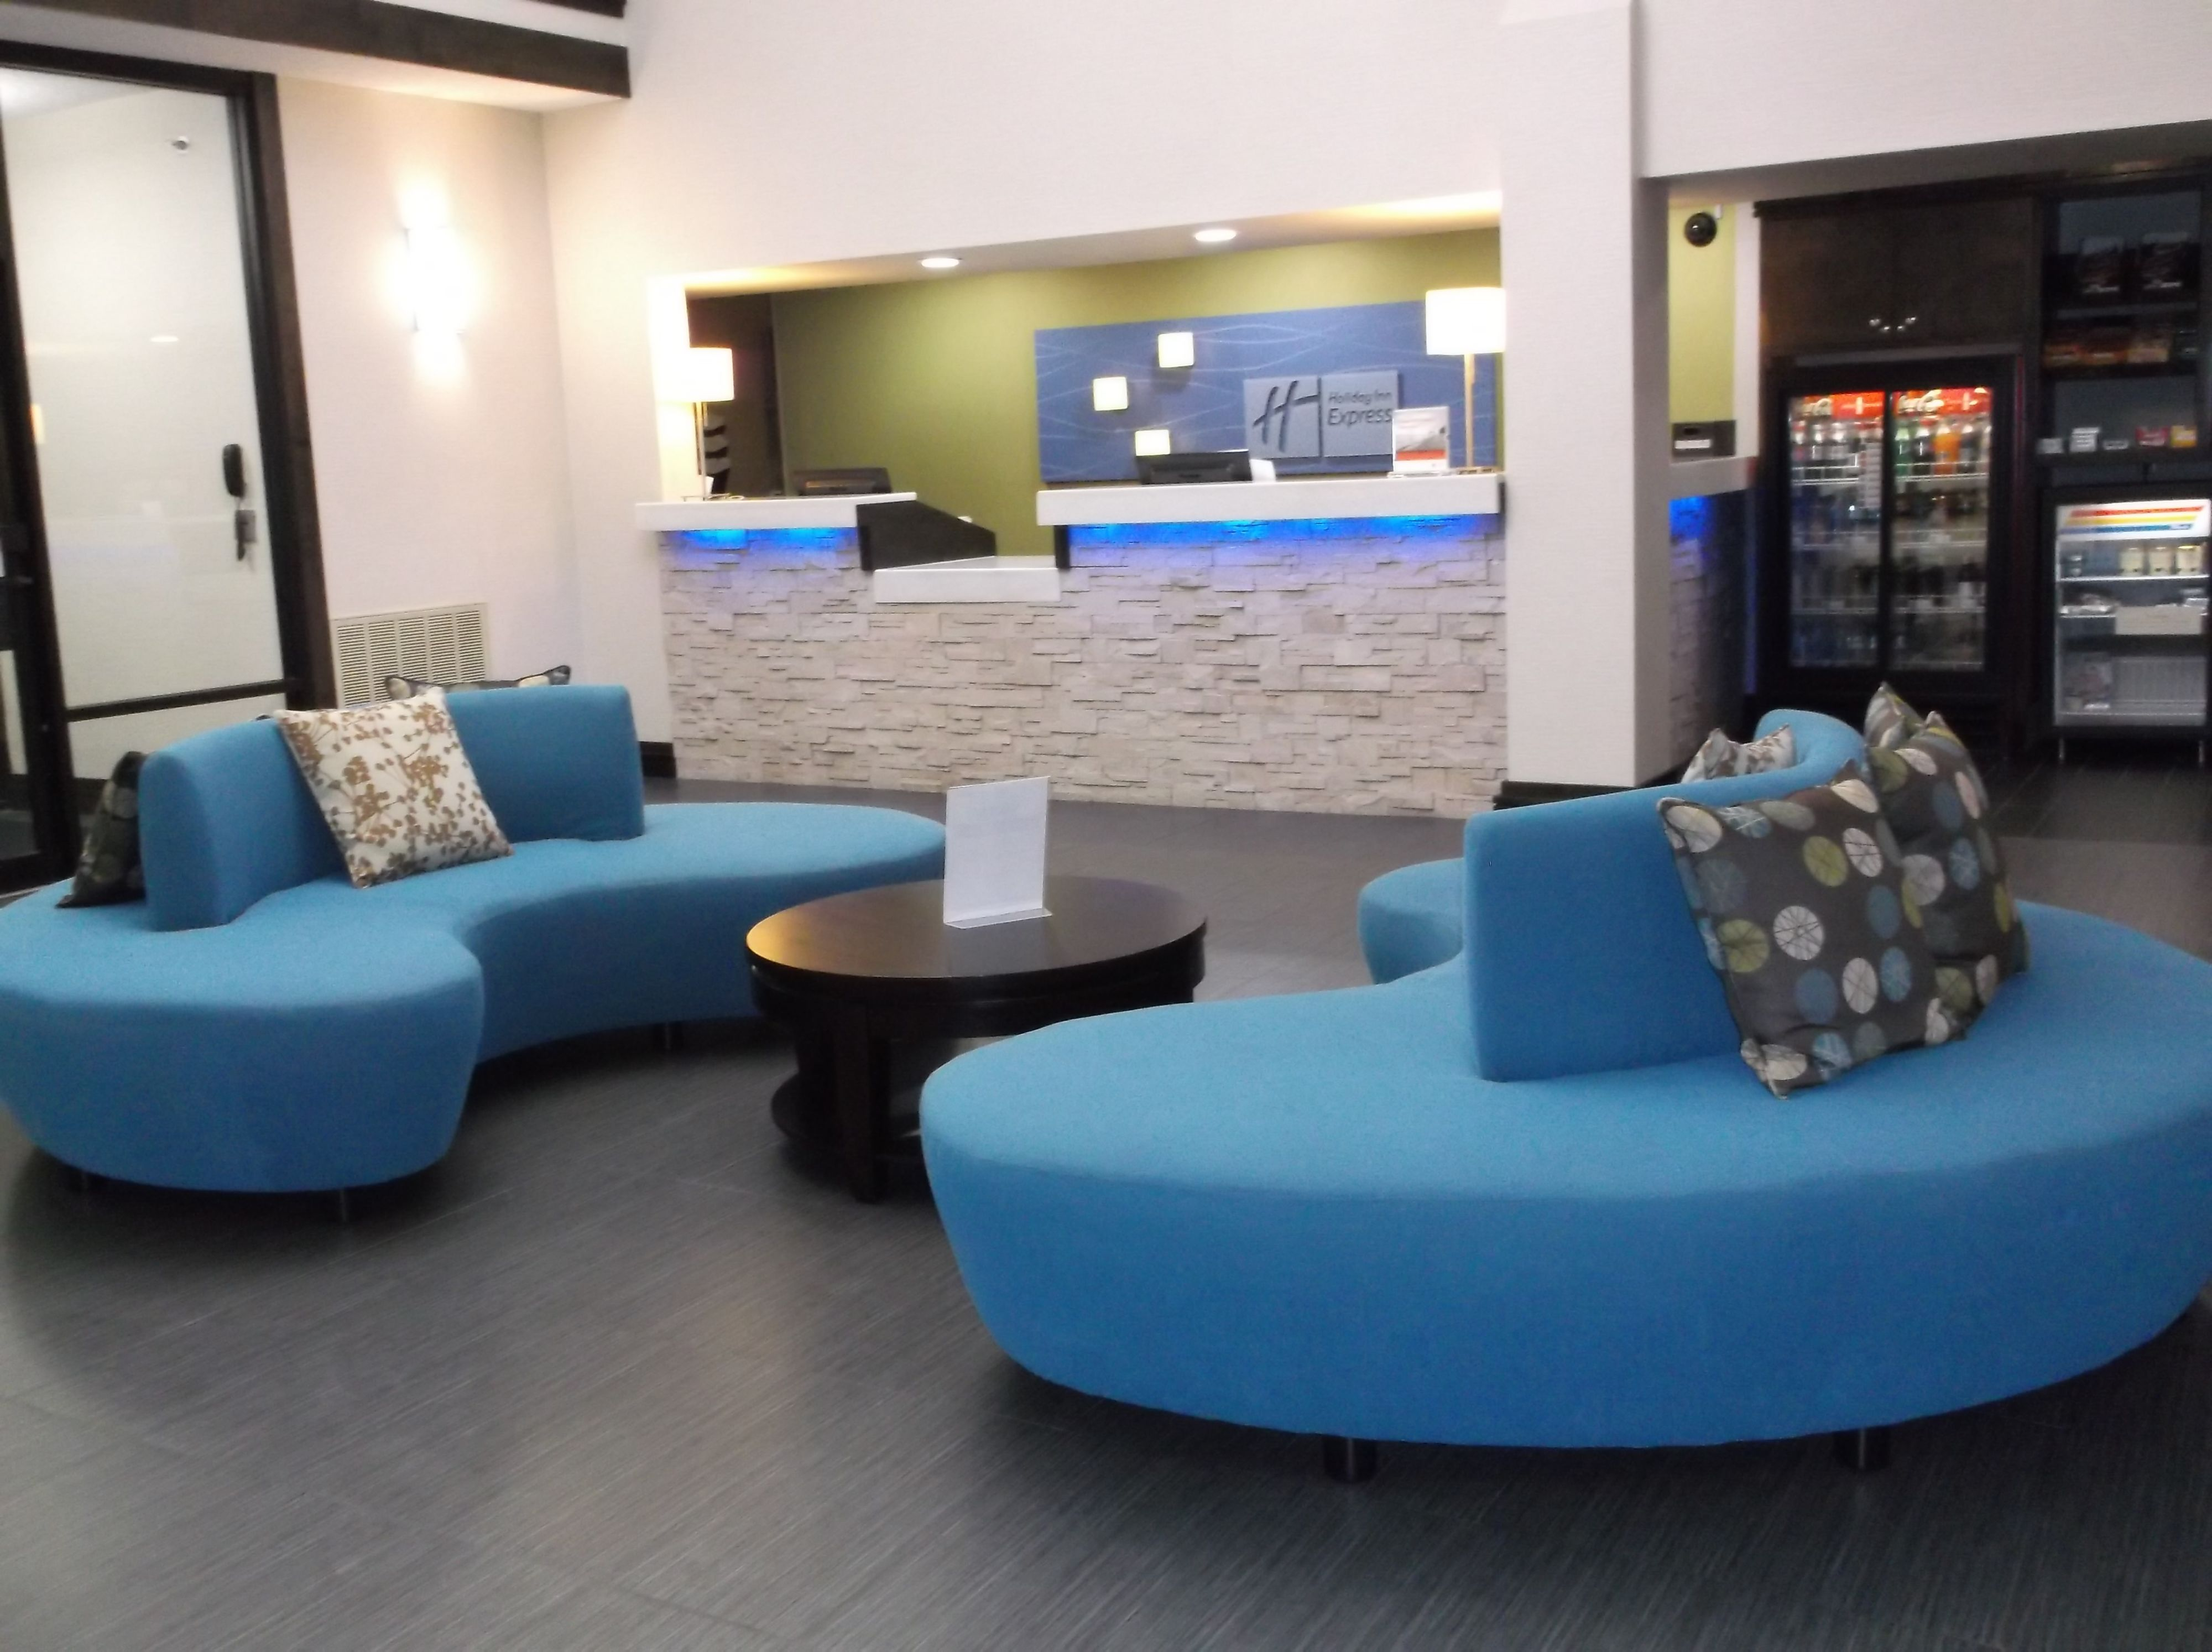 Holiday Inn Express Bentonville image 4